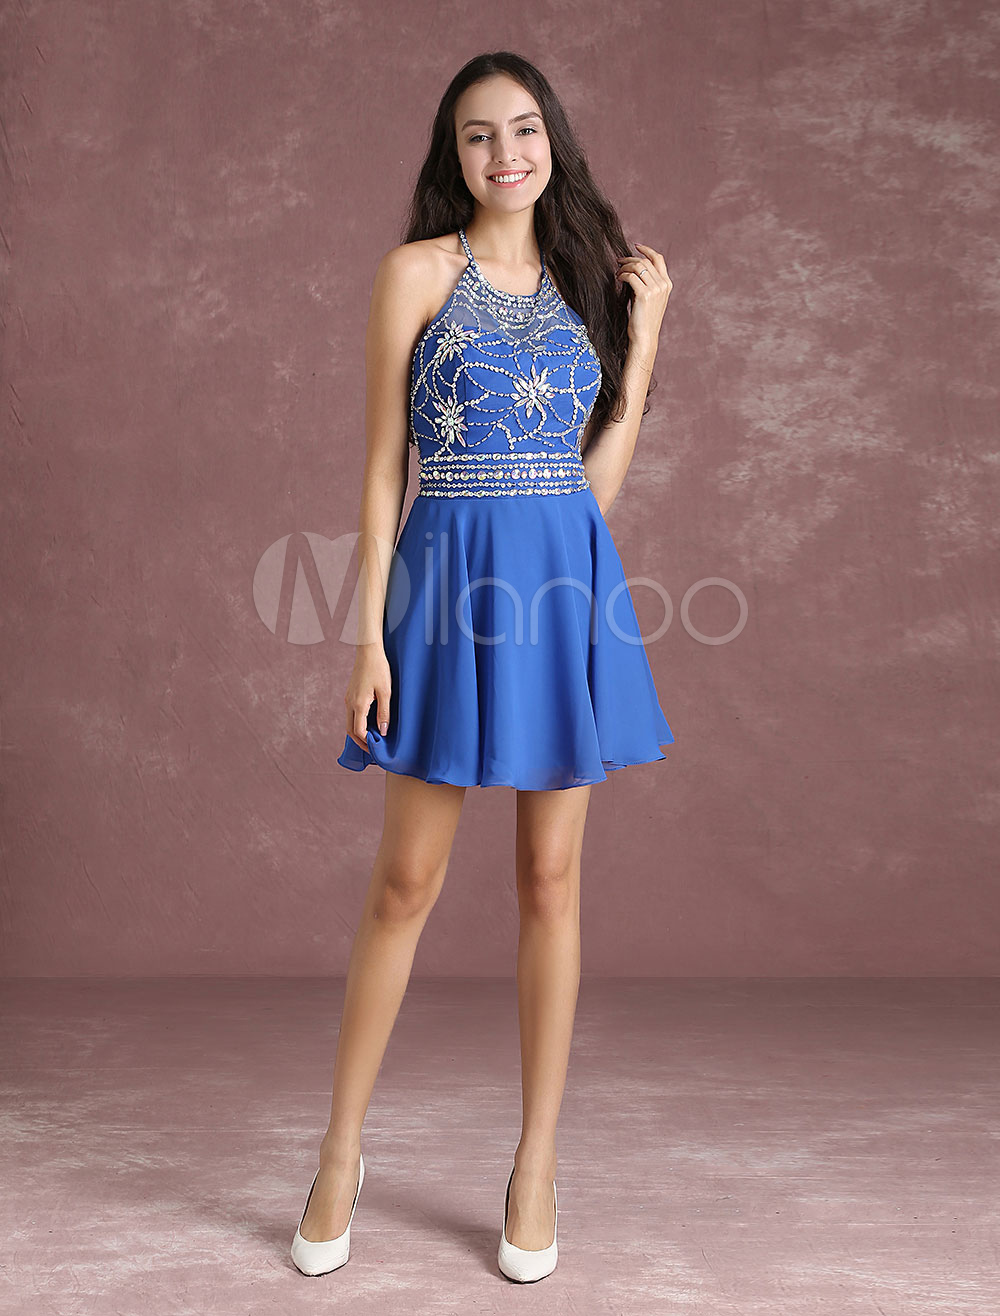 Chiffon Homecoming Dress Loyal Blue Backless Short Prom Dresses Halter Beading A Line Mini Cocktail Dress (Wedding) photo